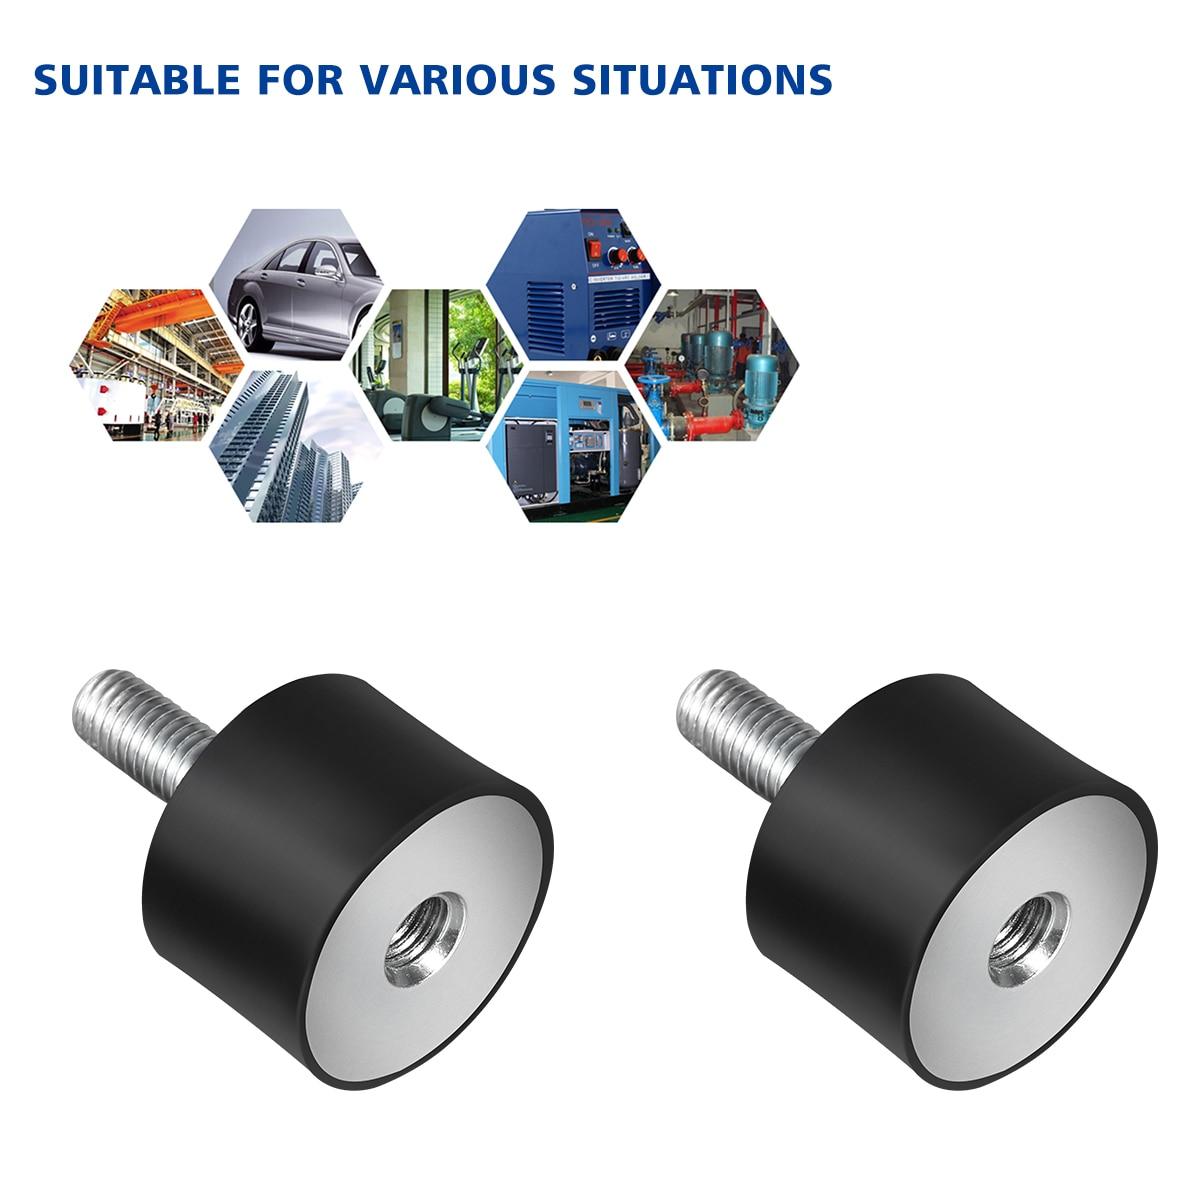 4PCS Rubber Mounts Anti Vibration Silent Block Tool for Car Boat Bobbins Tool Accessories